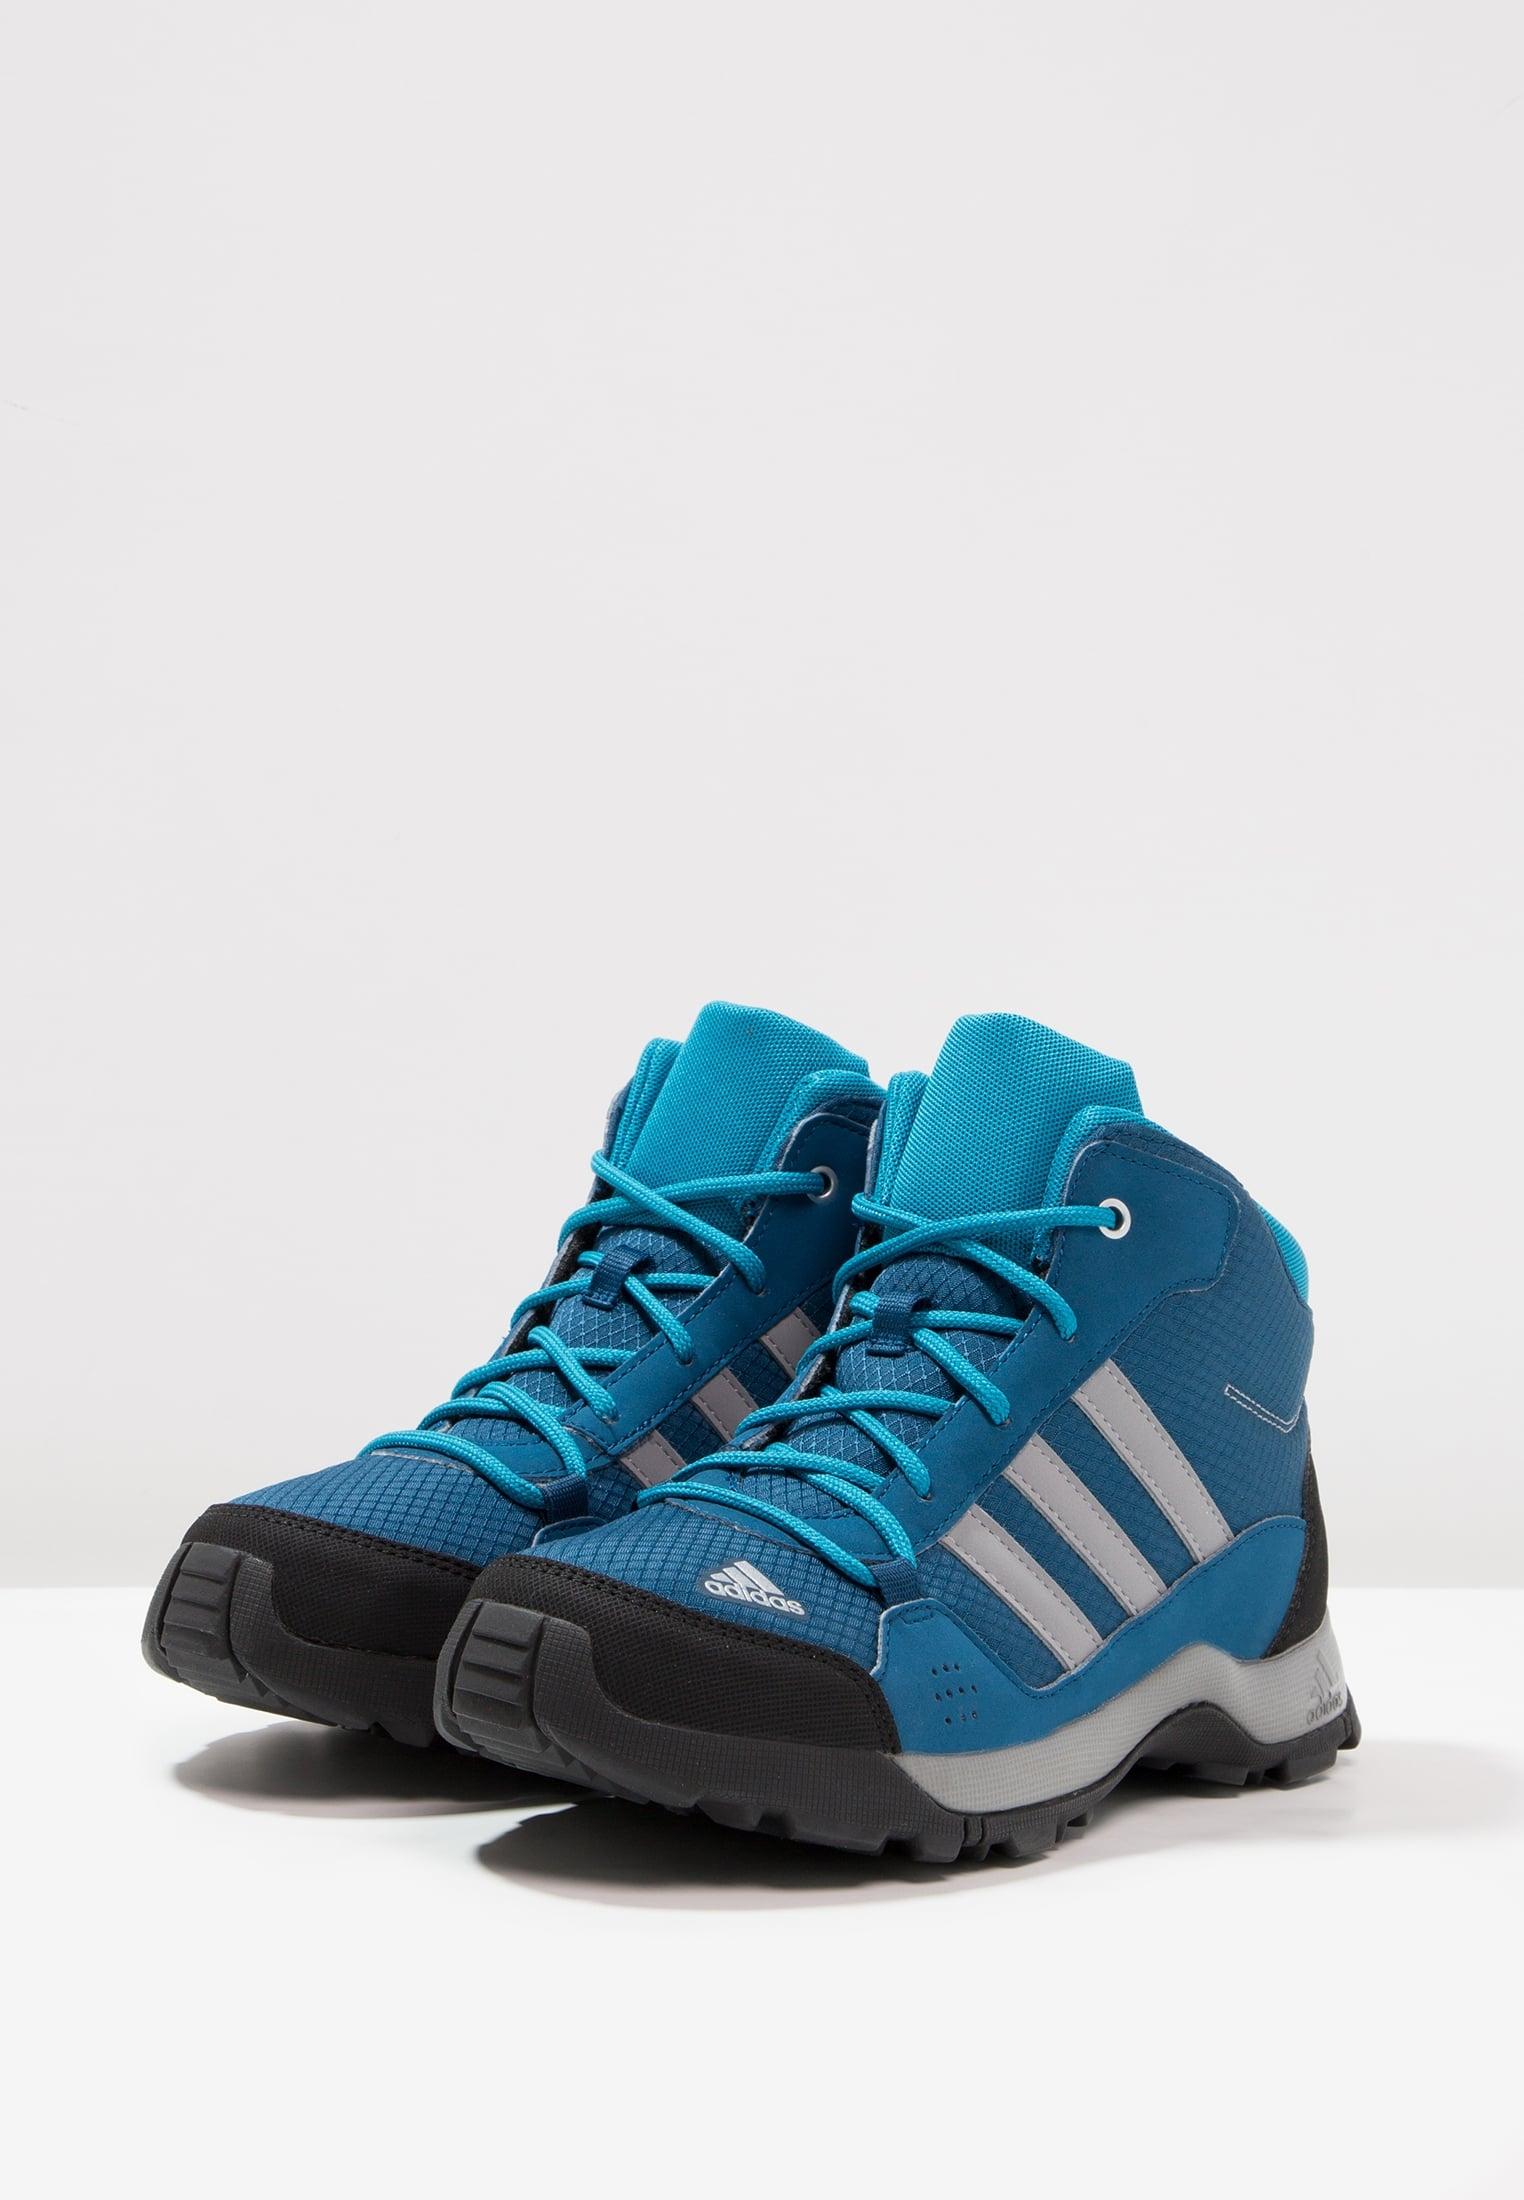 Chaussures Adidas Randonnée Gris Bleu Hyperhiker K Ibf67Yvgy